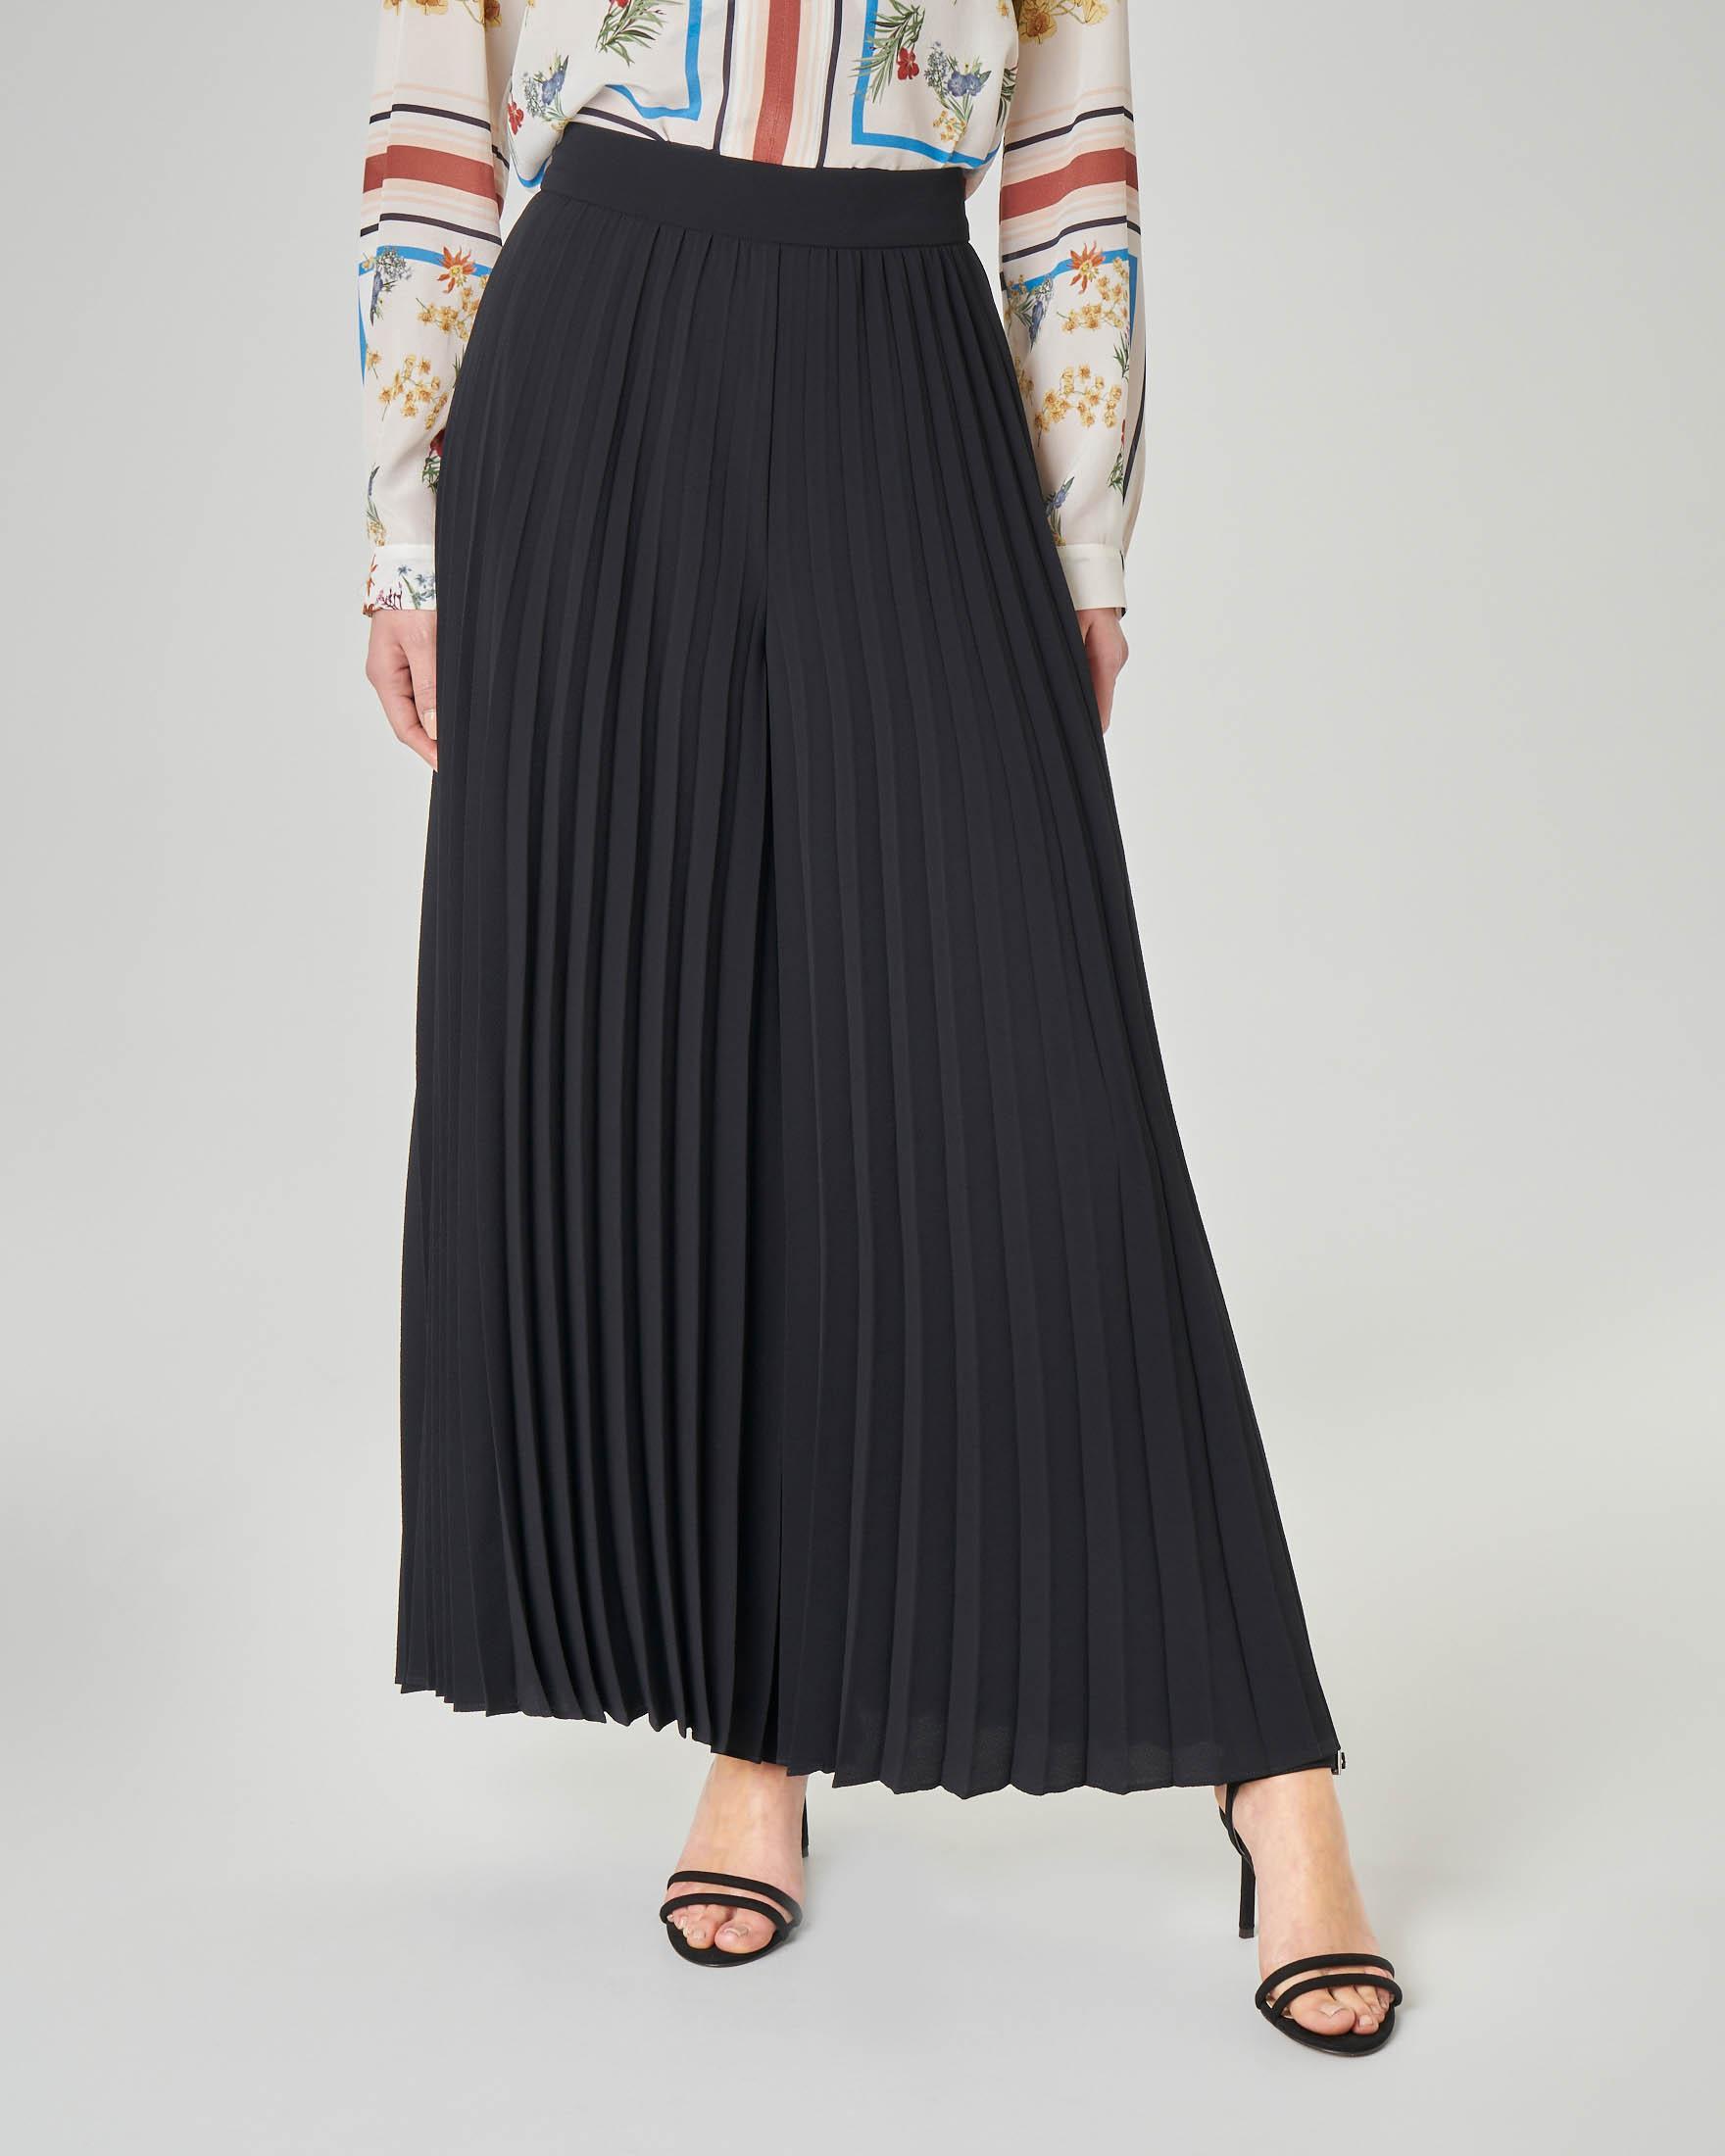 Pantalone palazzo plissè nero